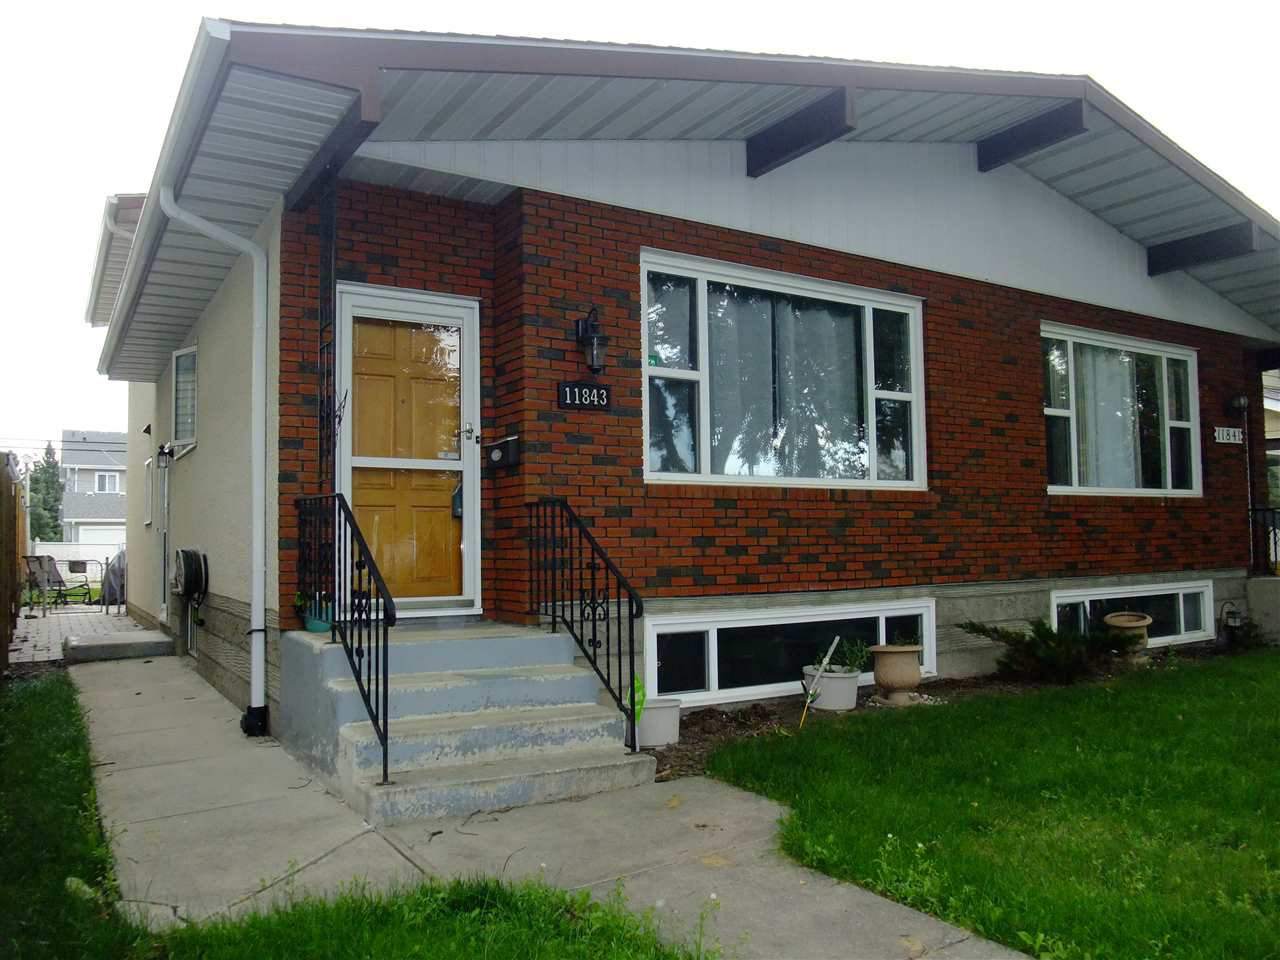 Main Photo: 11843 123 Street in Edmonton: Zone 04 House Half Duplex for sale : MLS®# E4167900